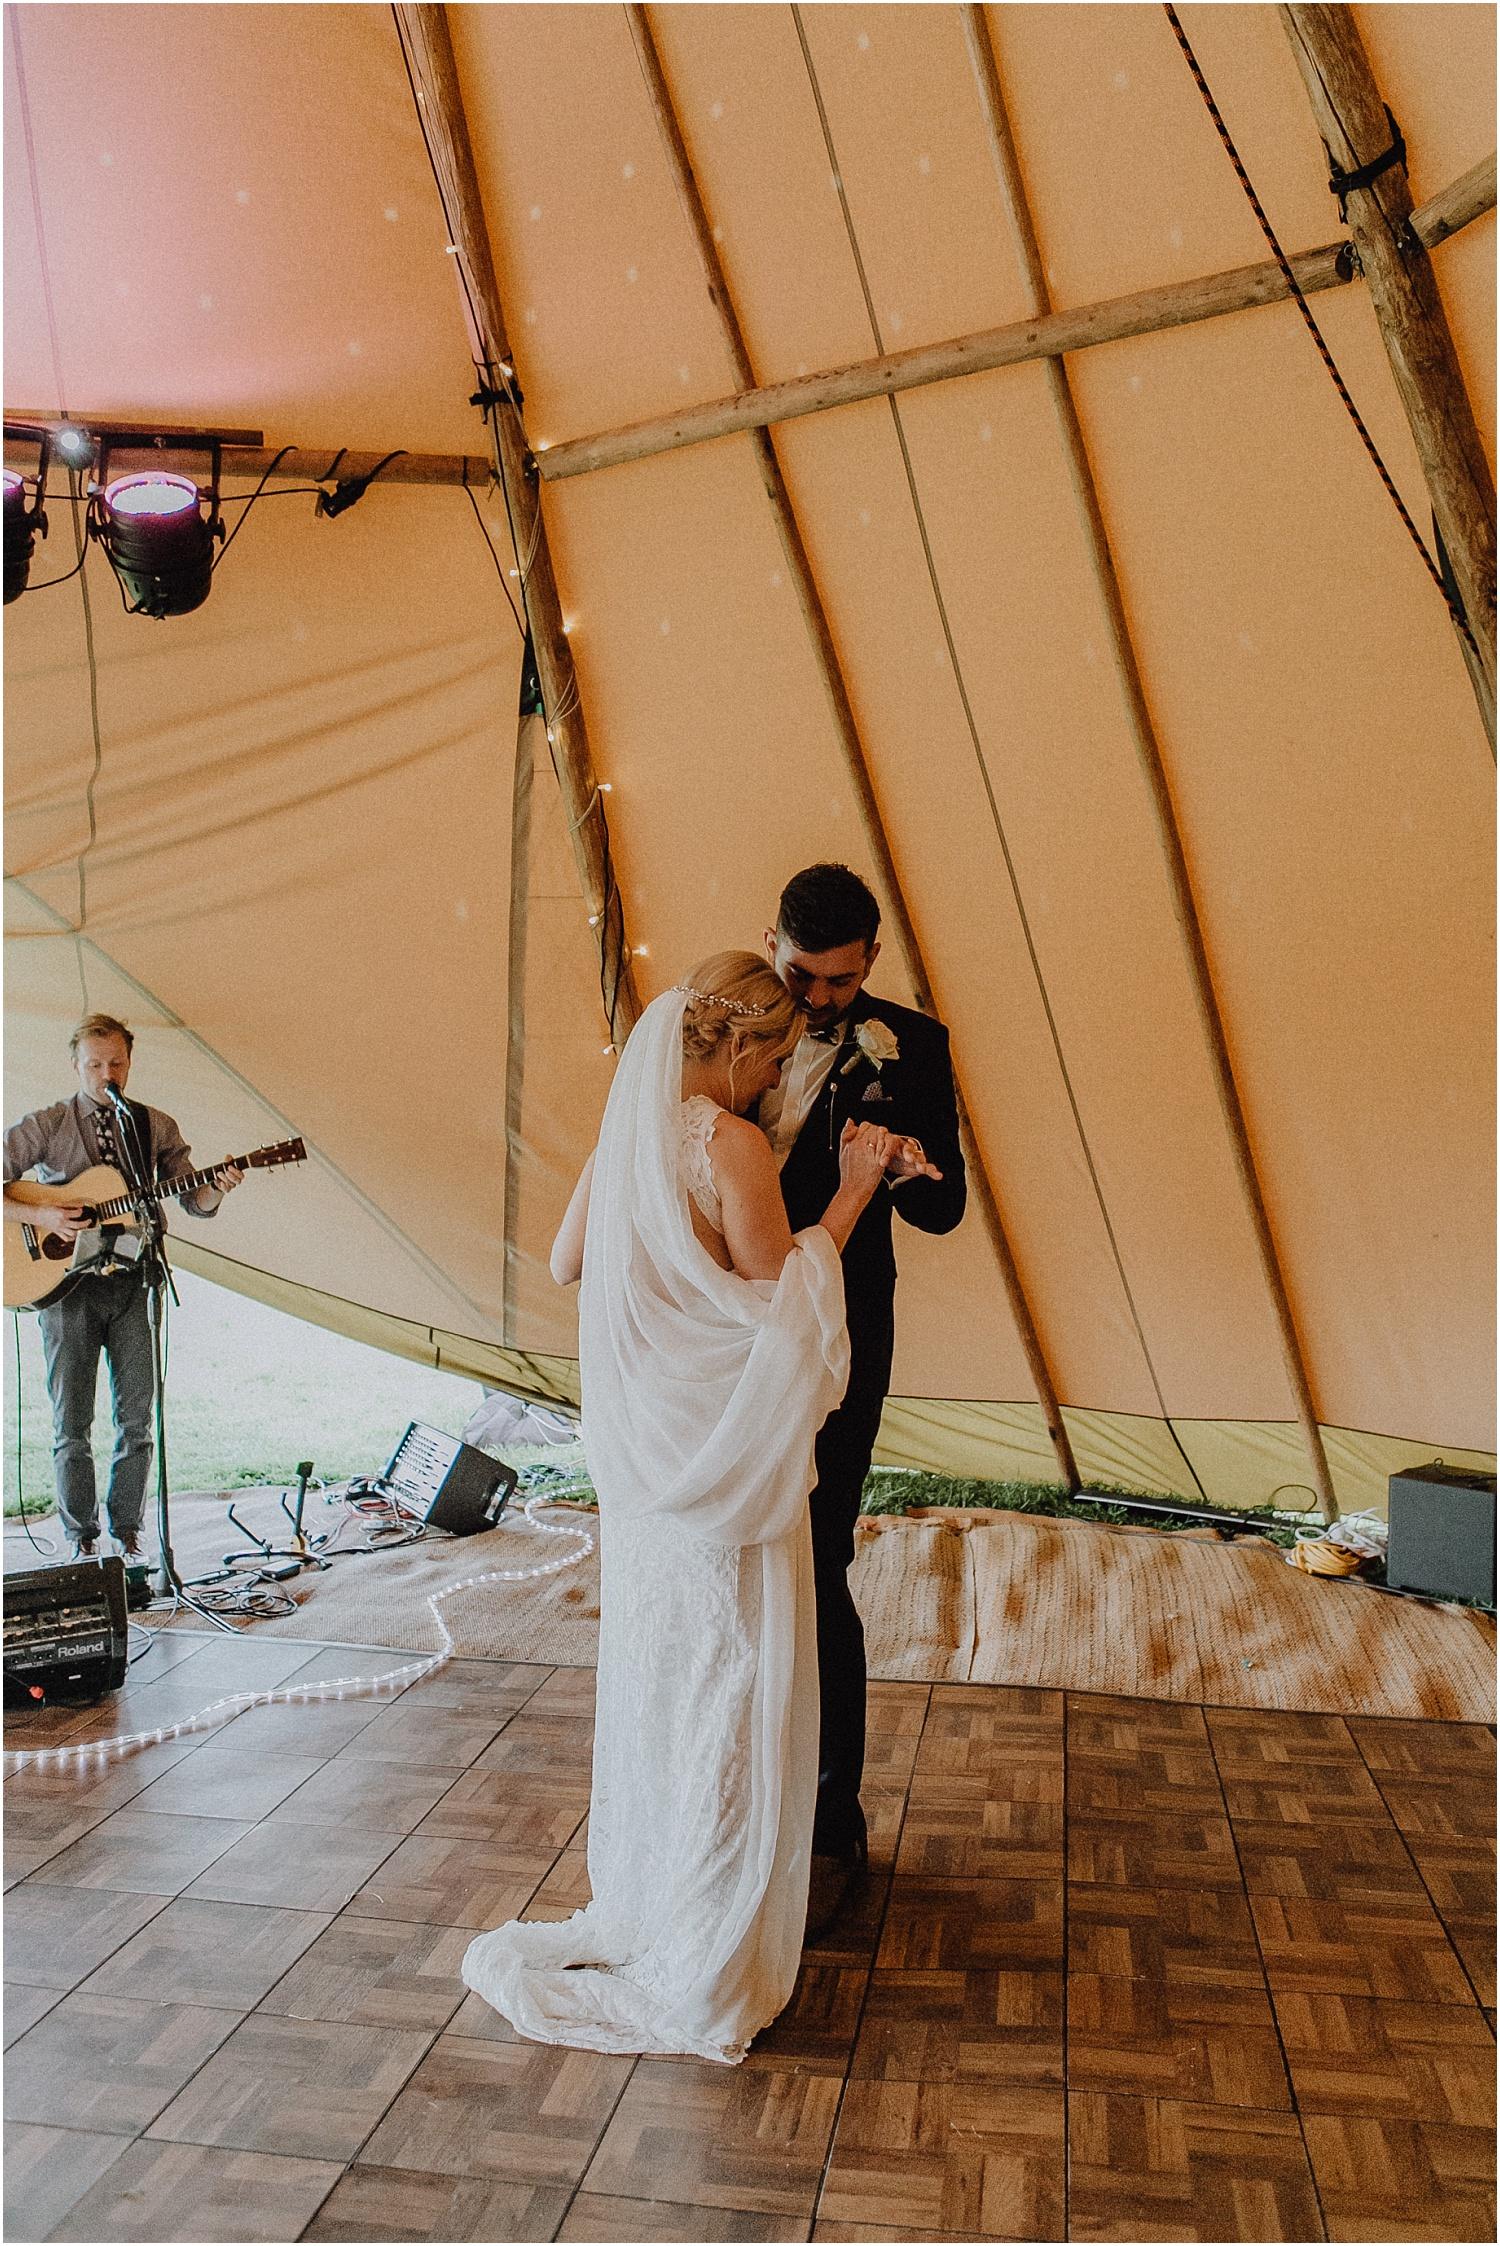 Nicolle and Damien's tipi wedding at the Flinders Yacht Club on the Mornington Peninsula._0176.jpg